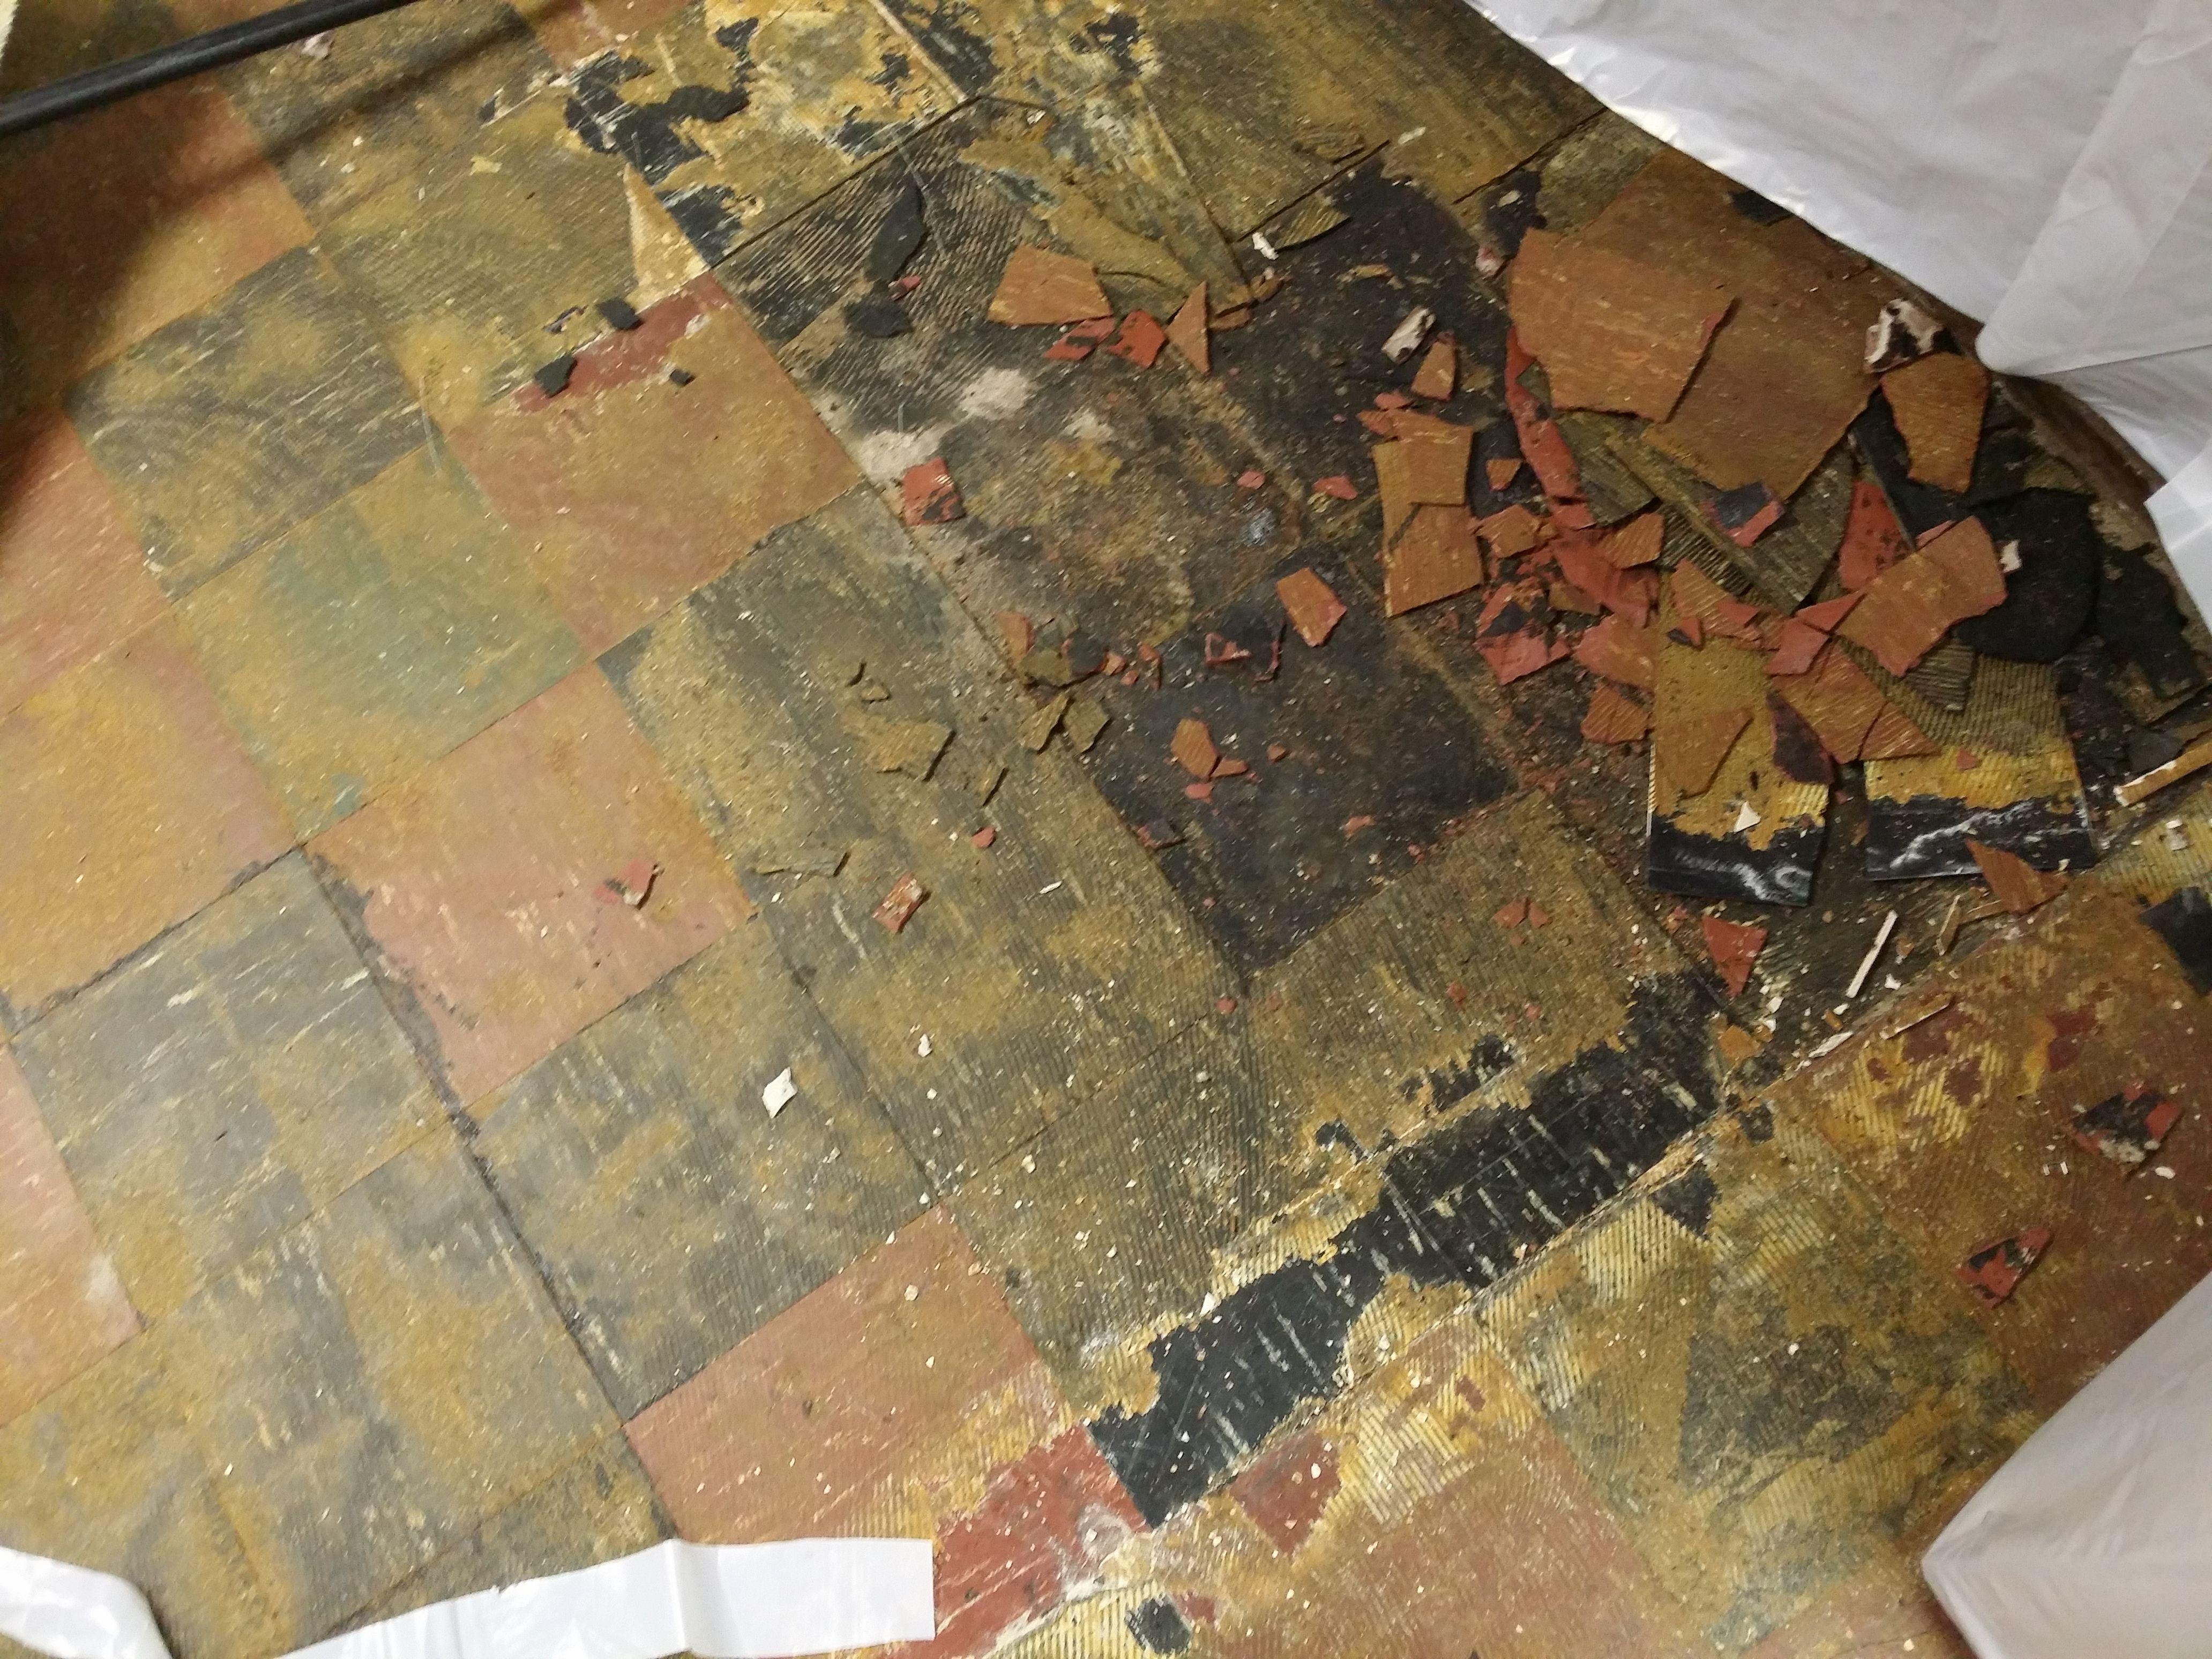 Asbestos Removal Abatement Pro Abatement 201 293 6305 Asbestos Tile Asbestos Removal Asbestos